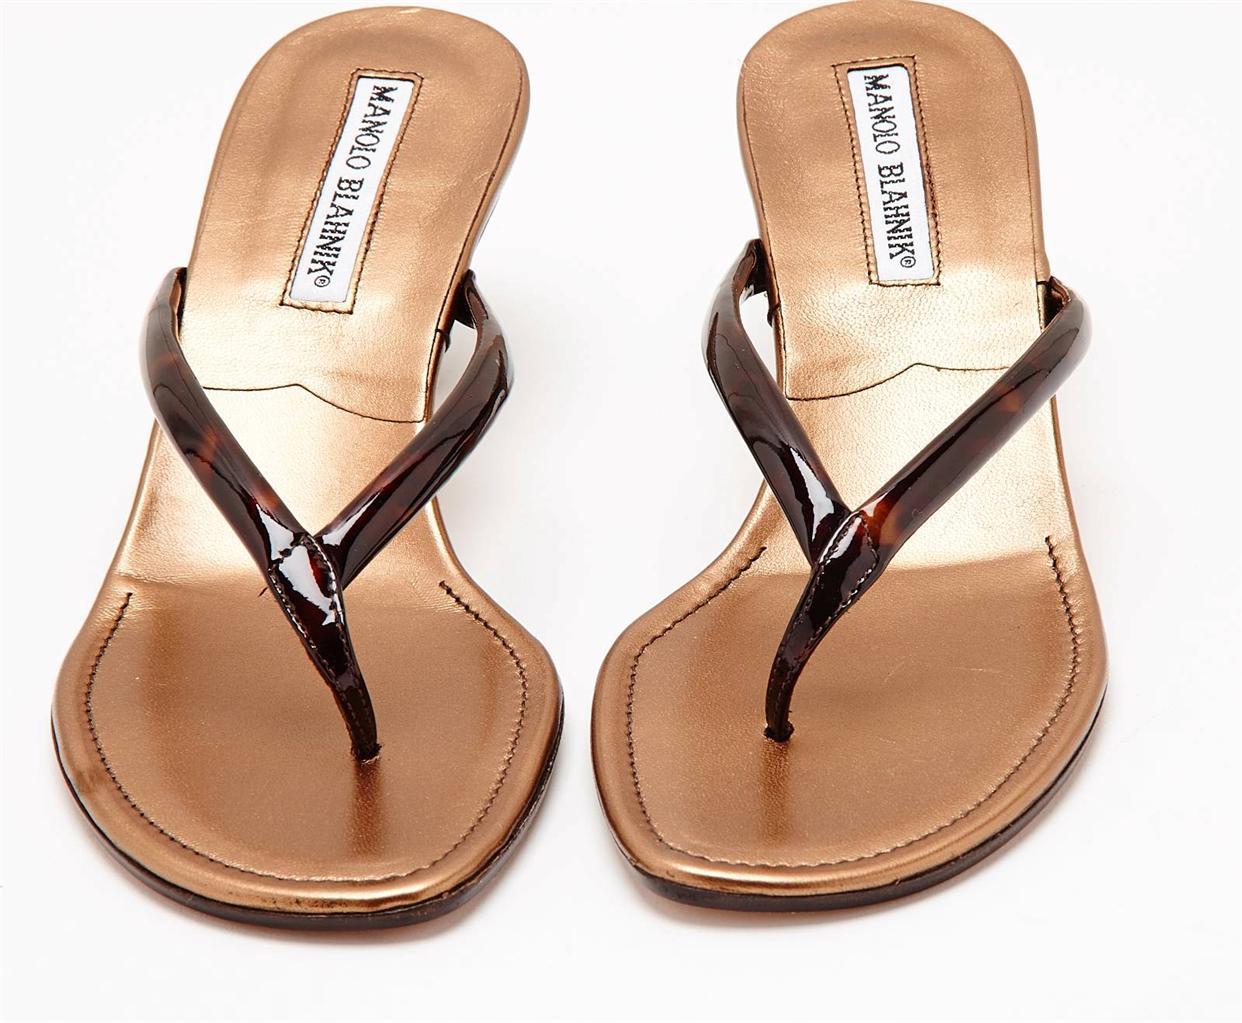 Best Shoe Size For Resale